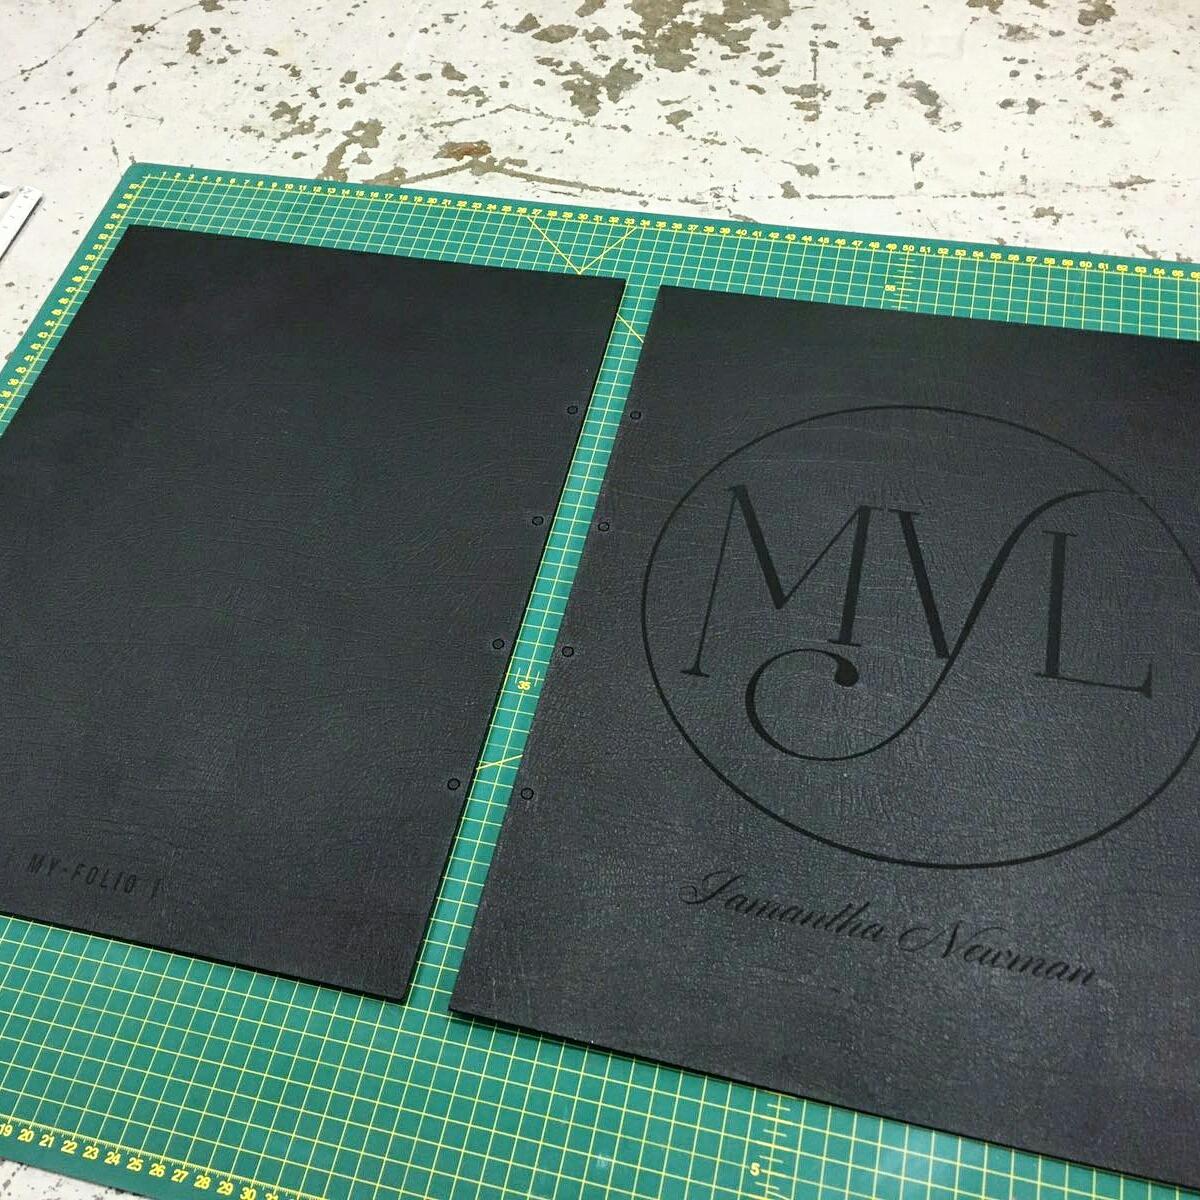 Bespoke leather portfolio